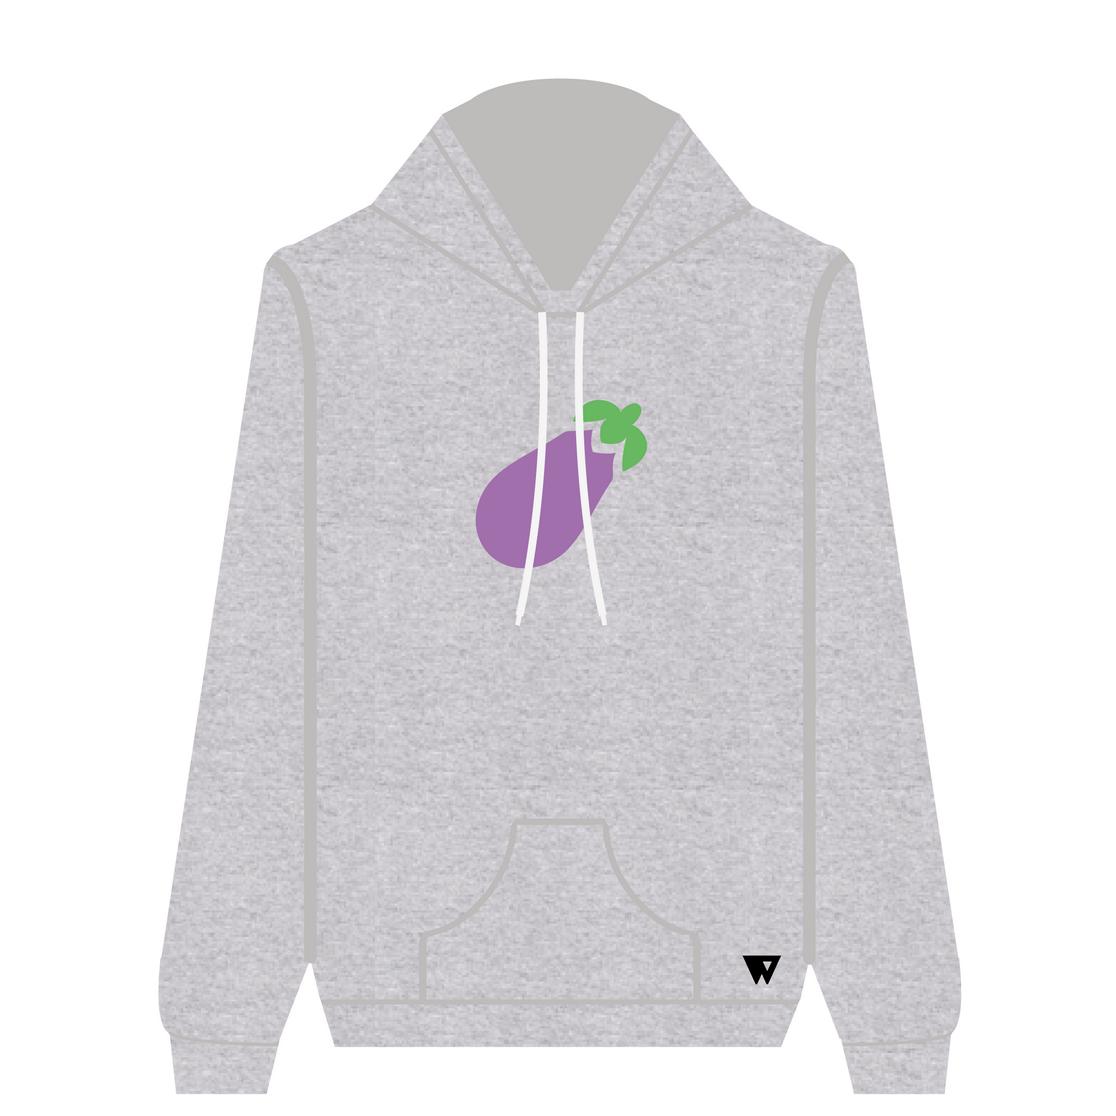 Hoodie Eggplant | Wuzzee